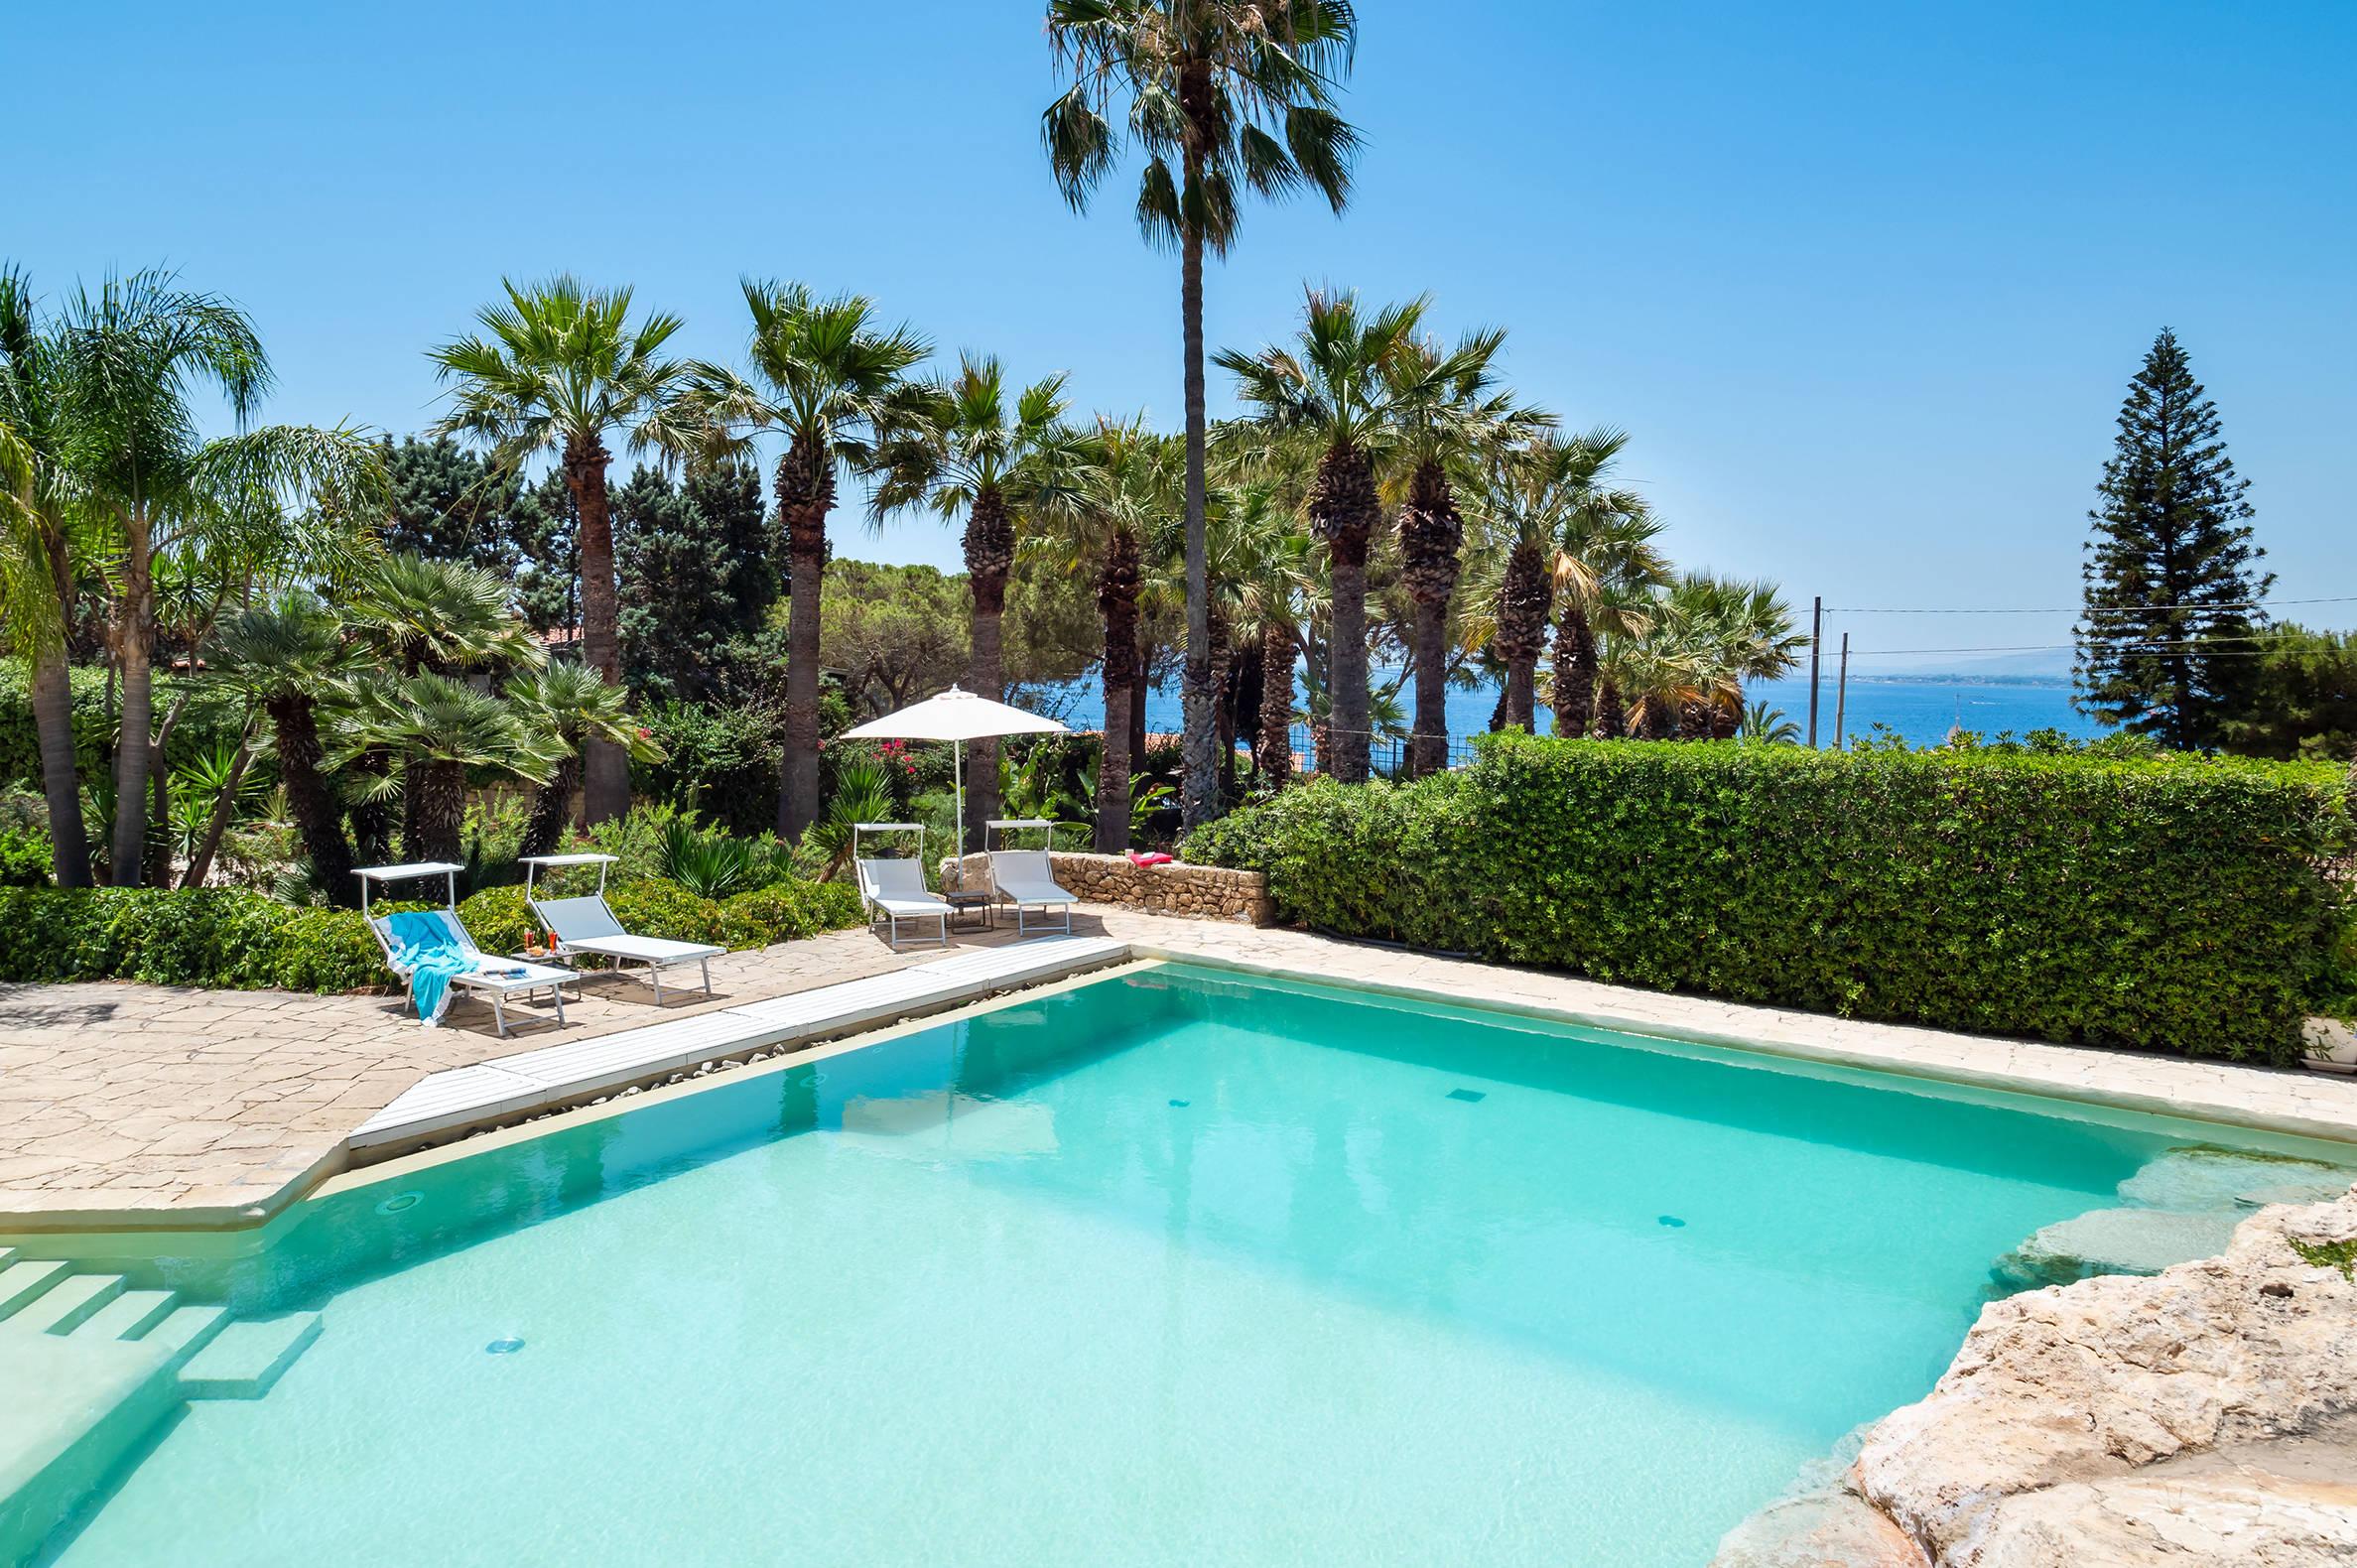 Vacation Rental Villa Rossana - 10 Guests